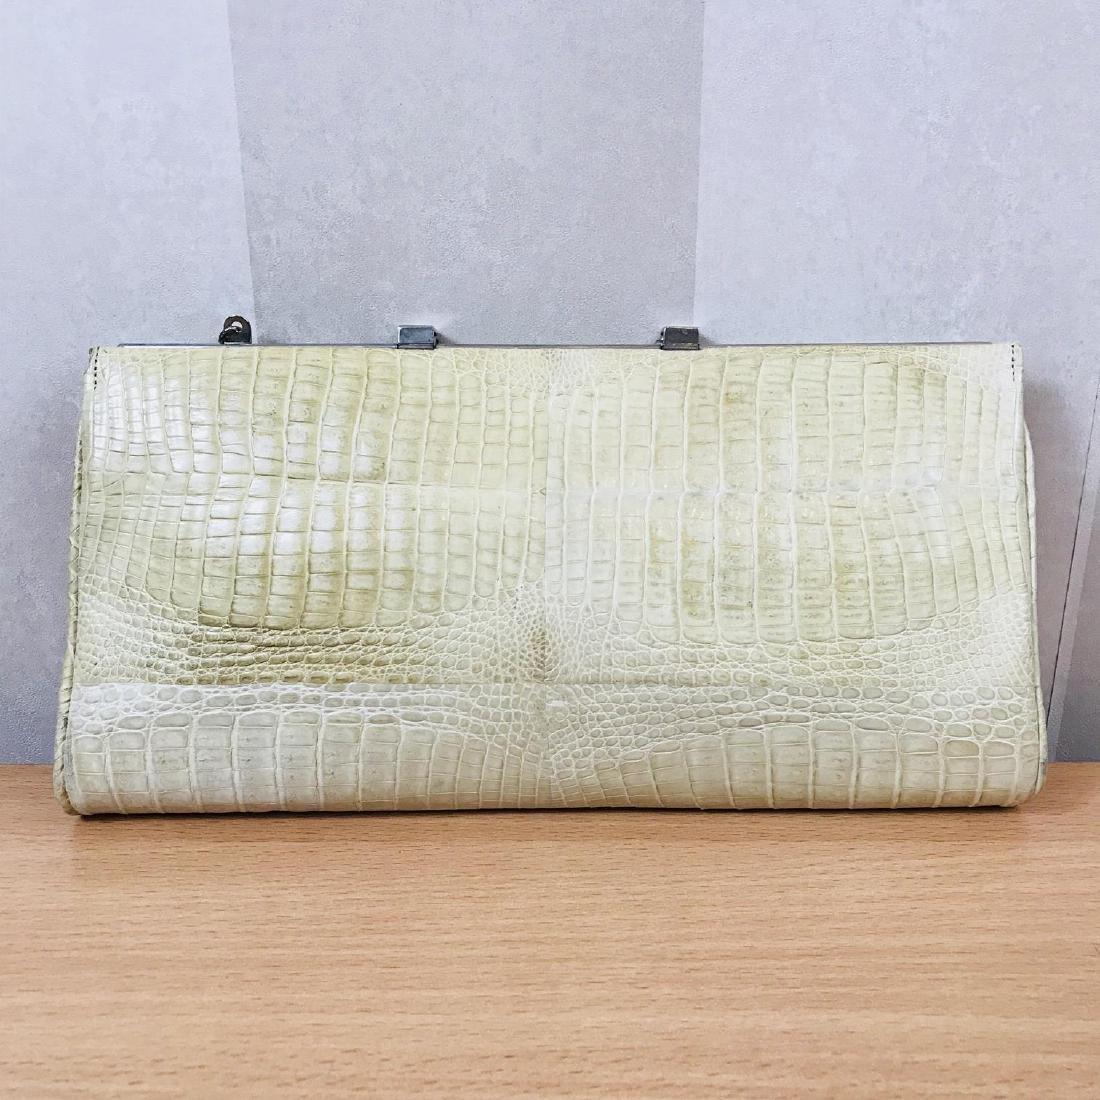 Vintage Beige Crocodile Leather Clutch Bag - 6